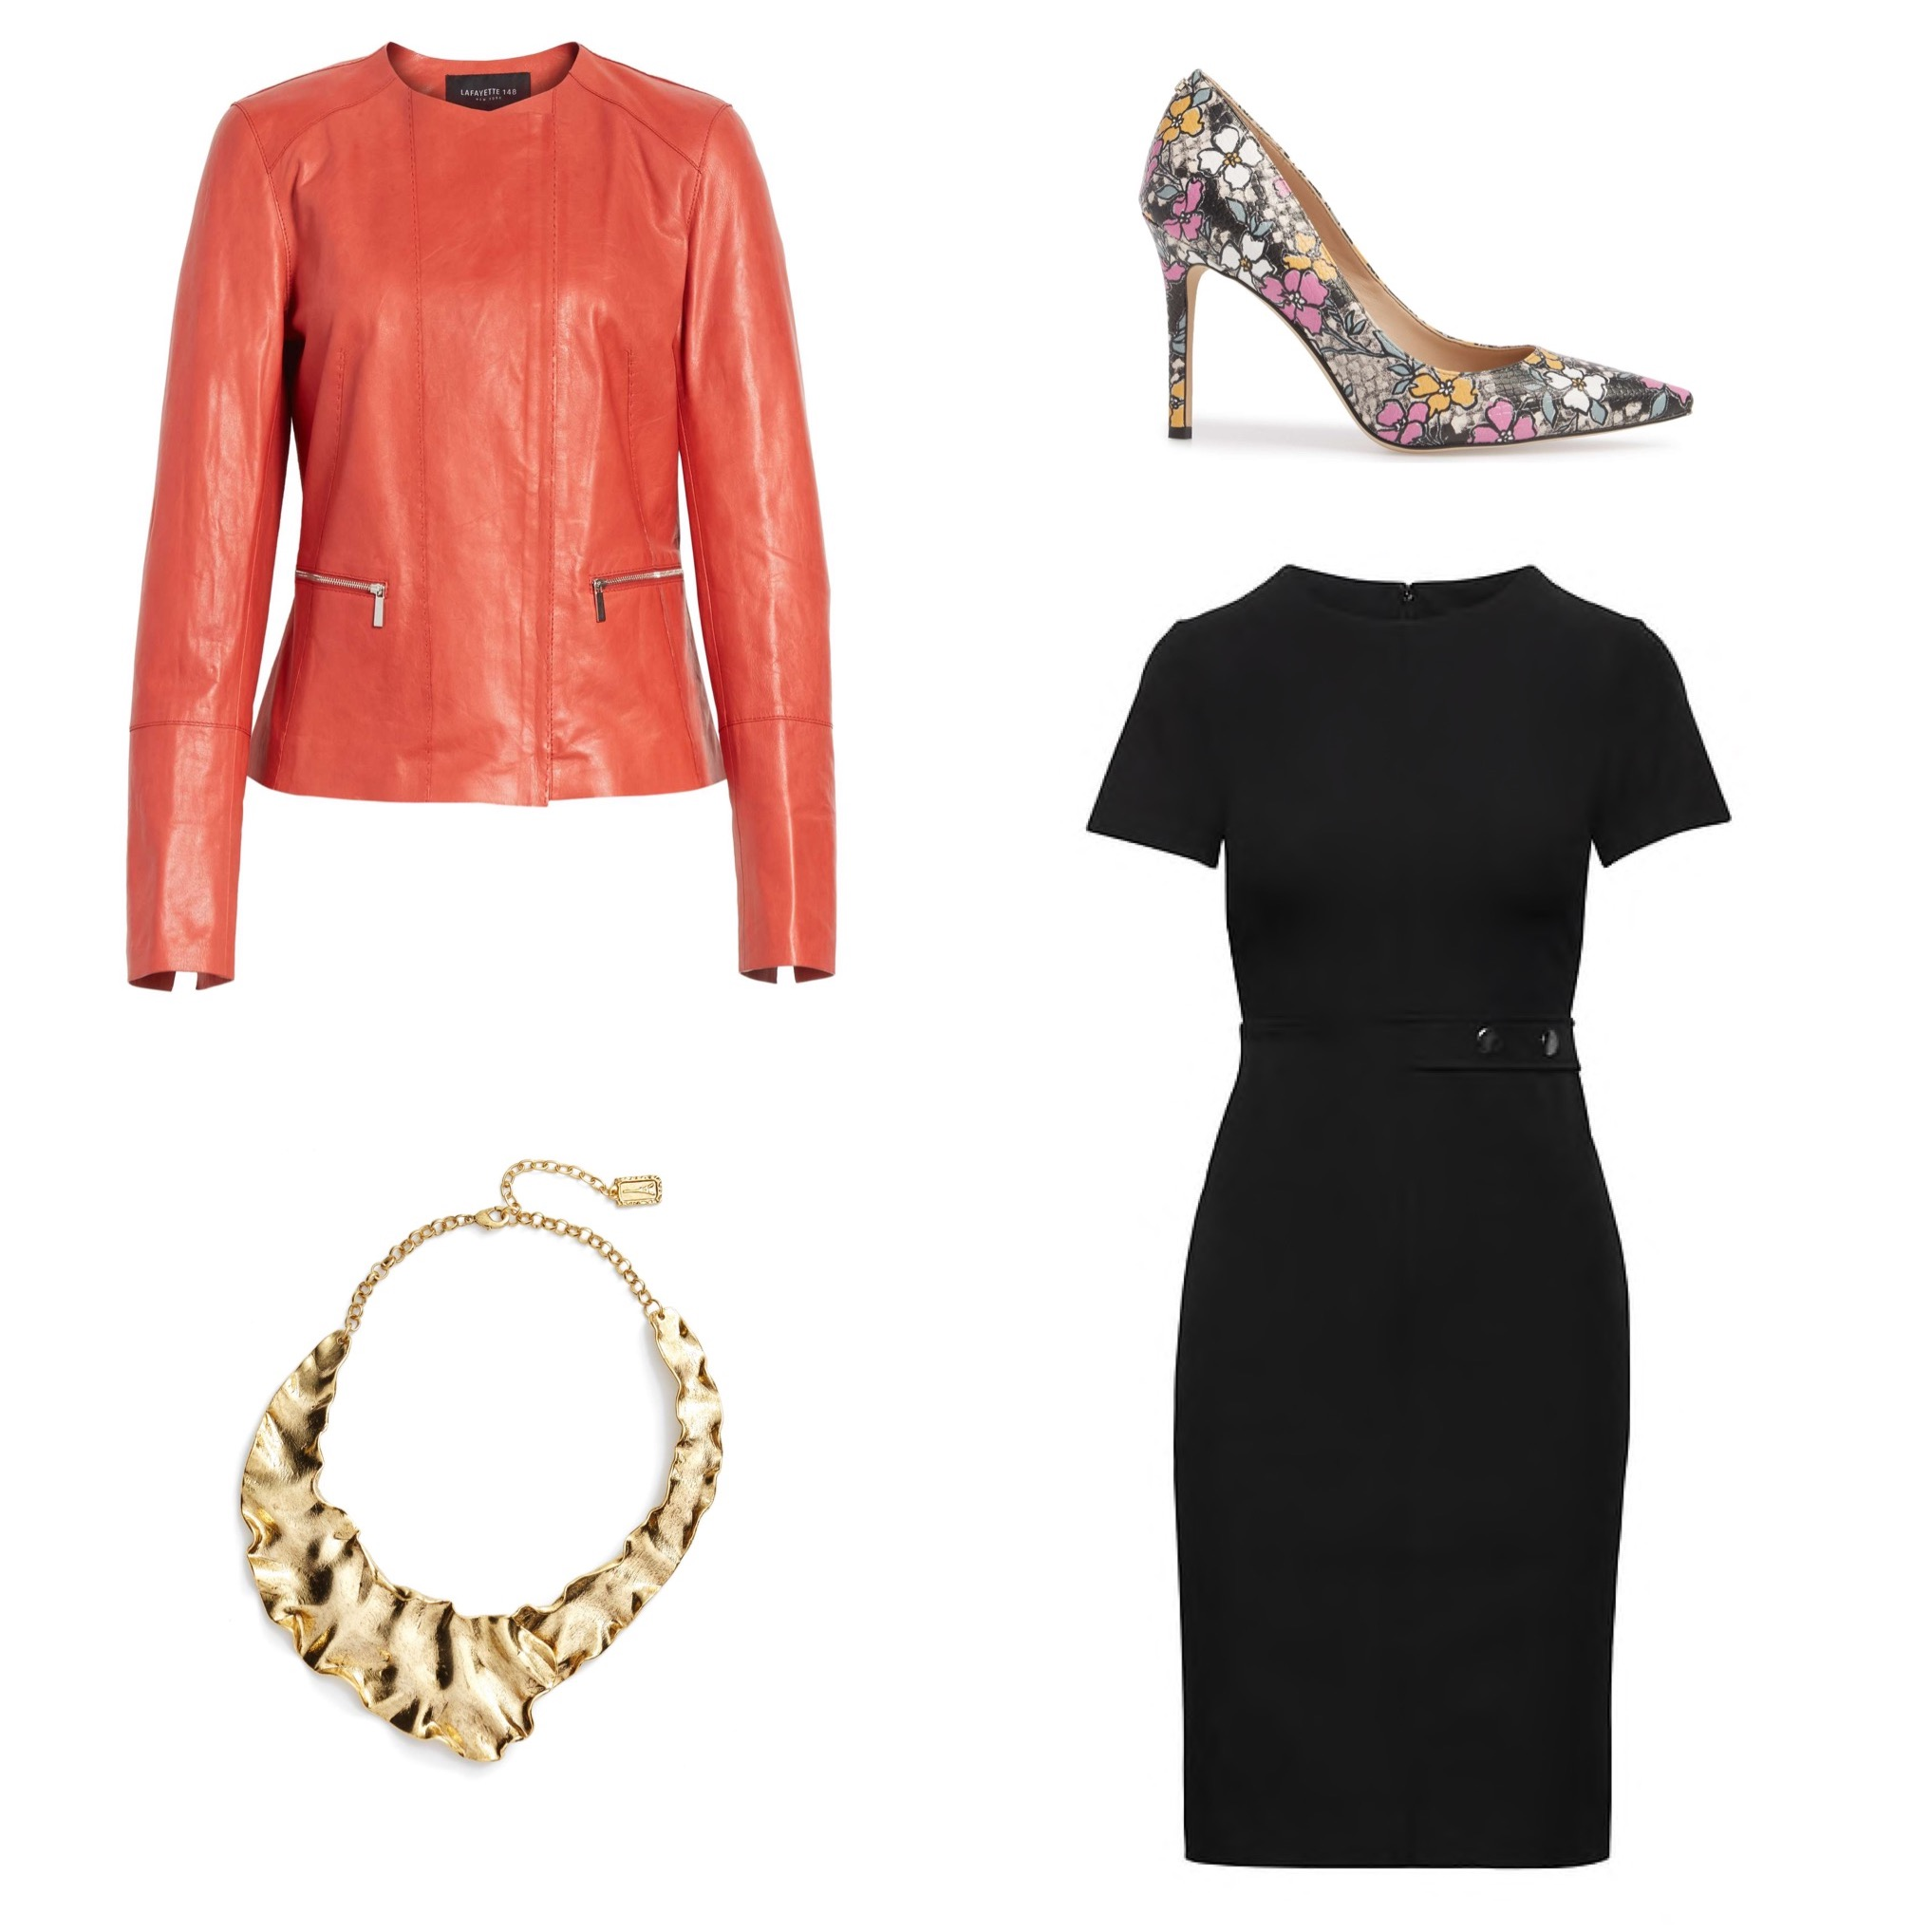 dress and leather jkt.jpeg